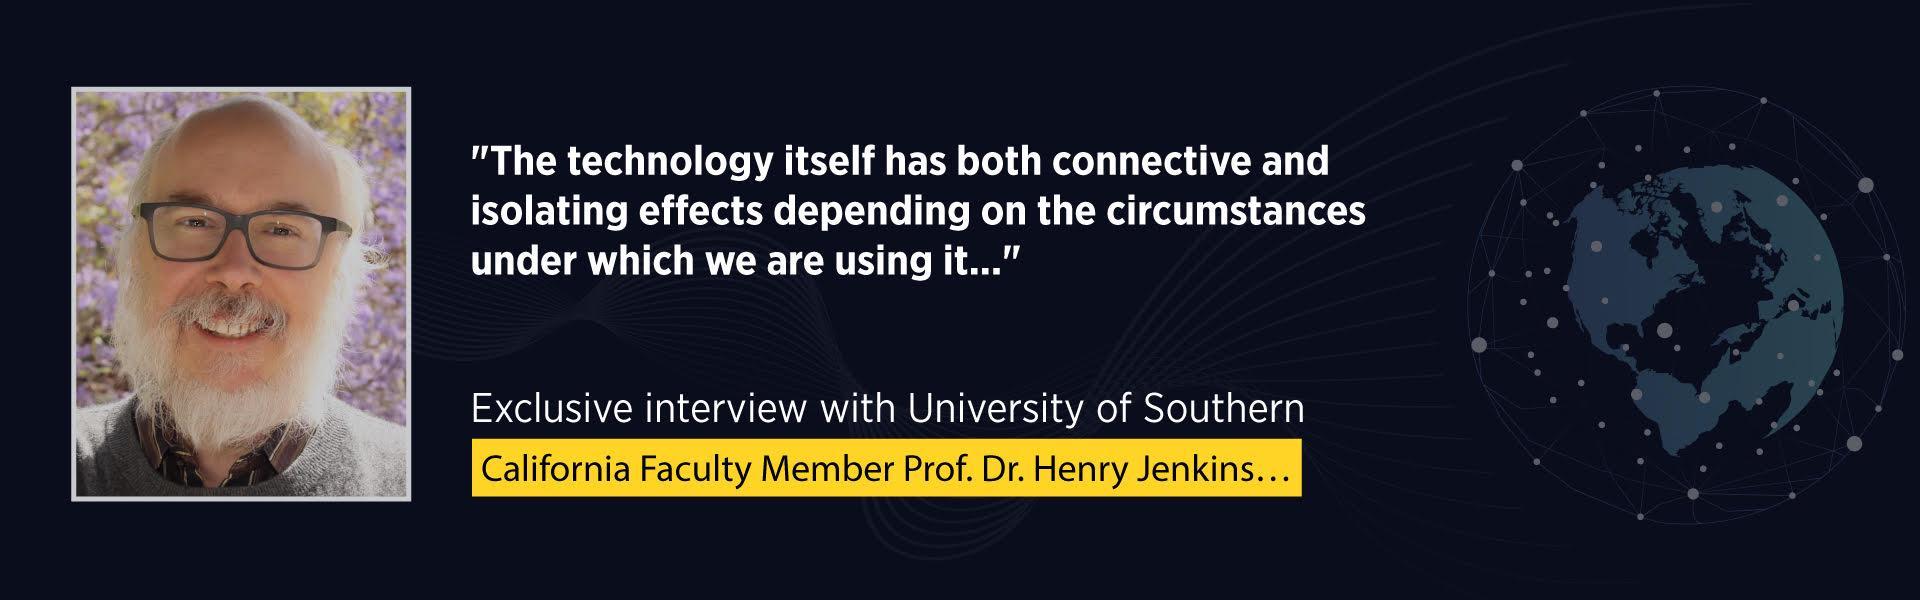 Henry-Jenkins New-media Distance-education COVID-19 Coronavirus